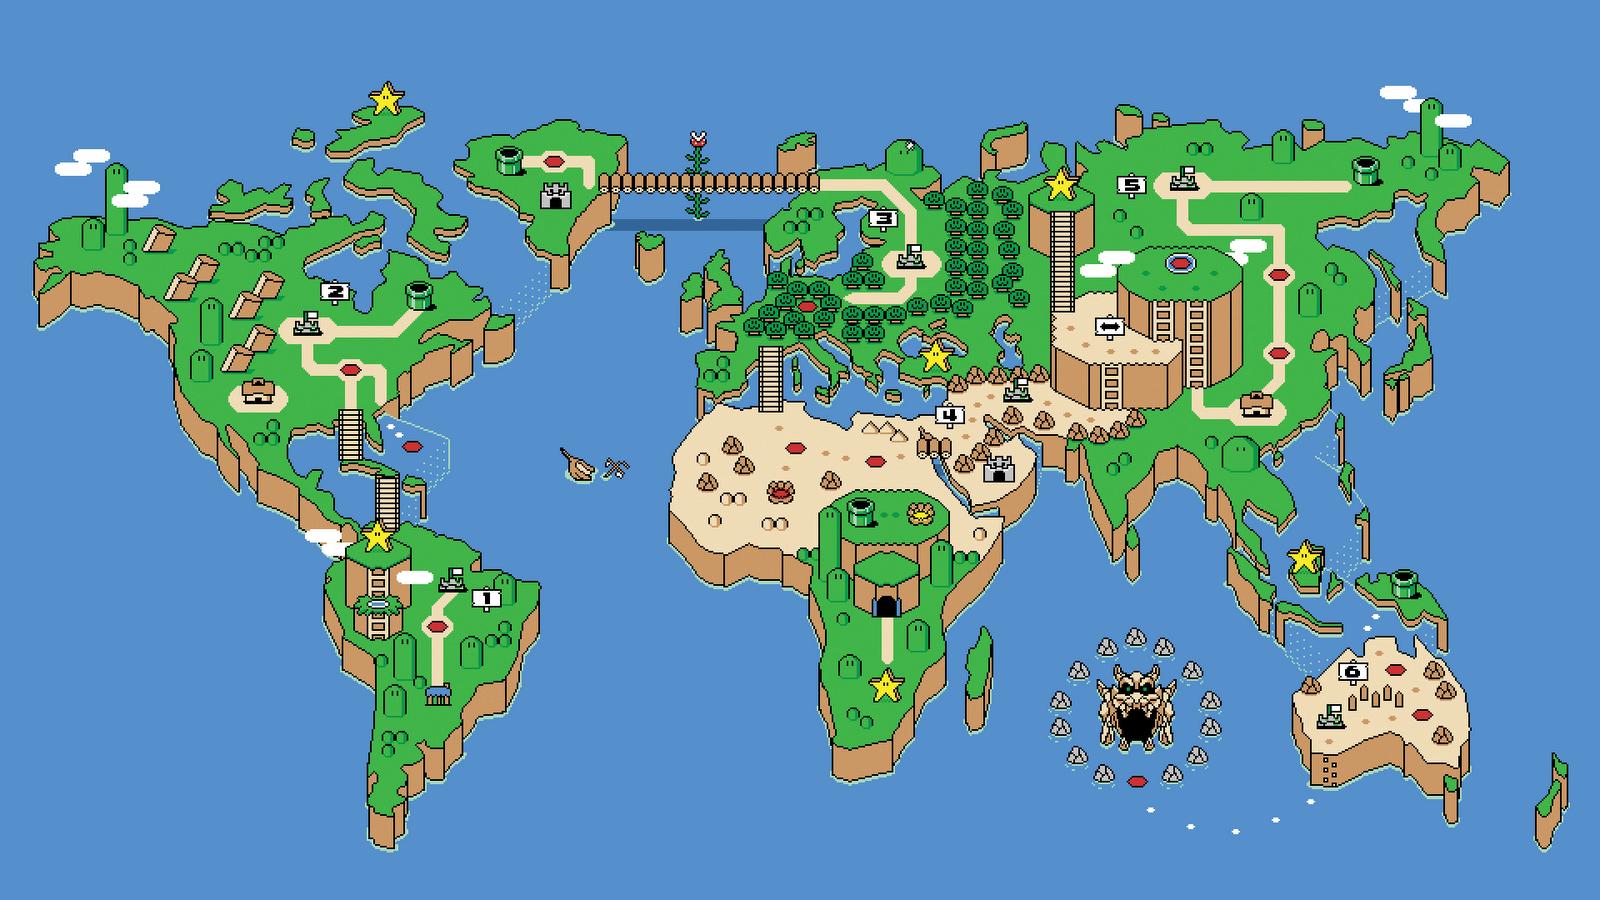 Seiken Densetsu 3 Wallpaper | Super Mario Map | Surf waves